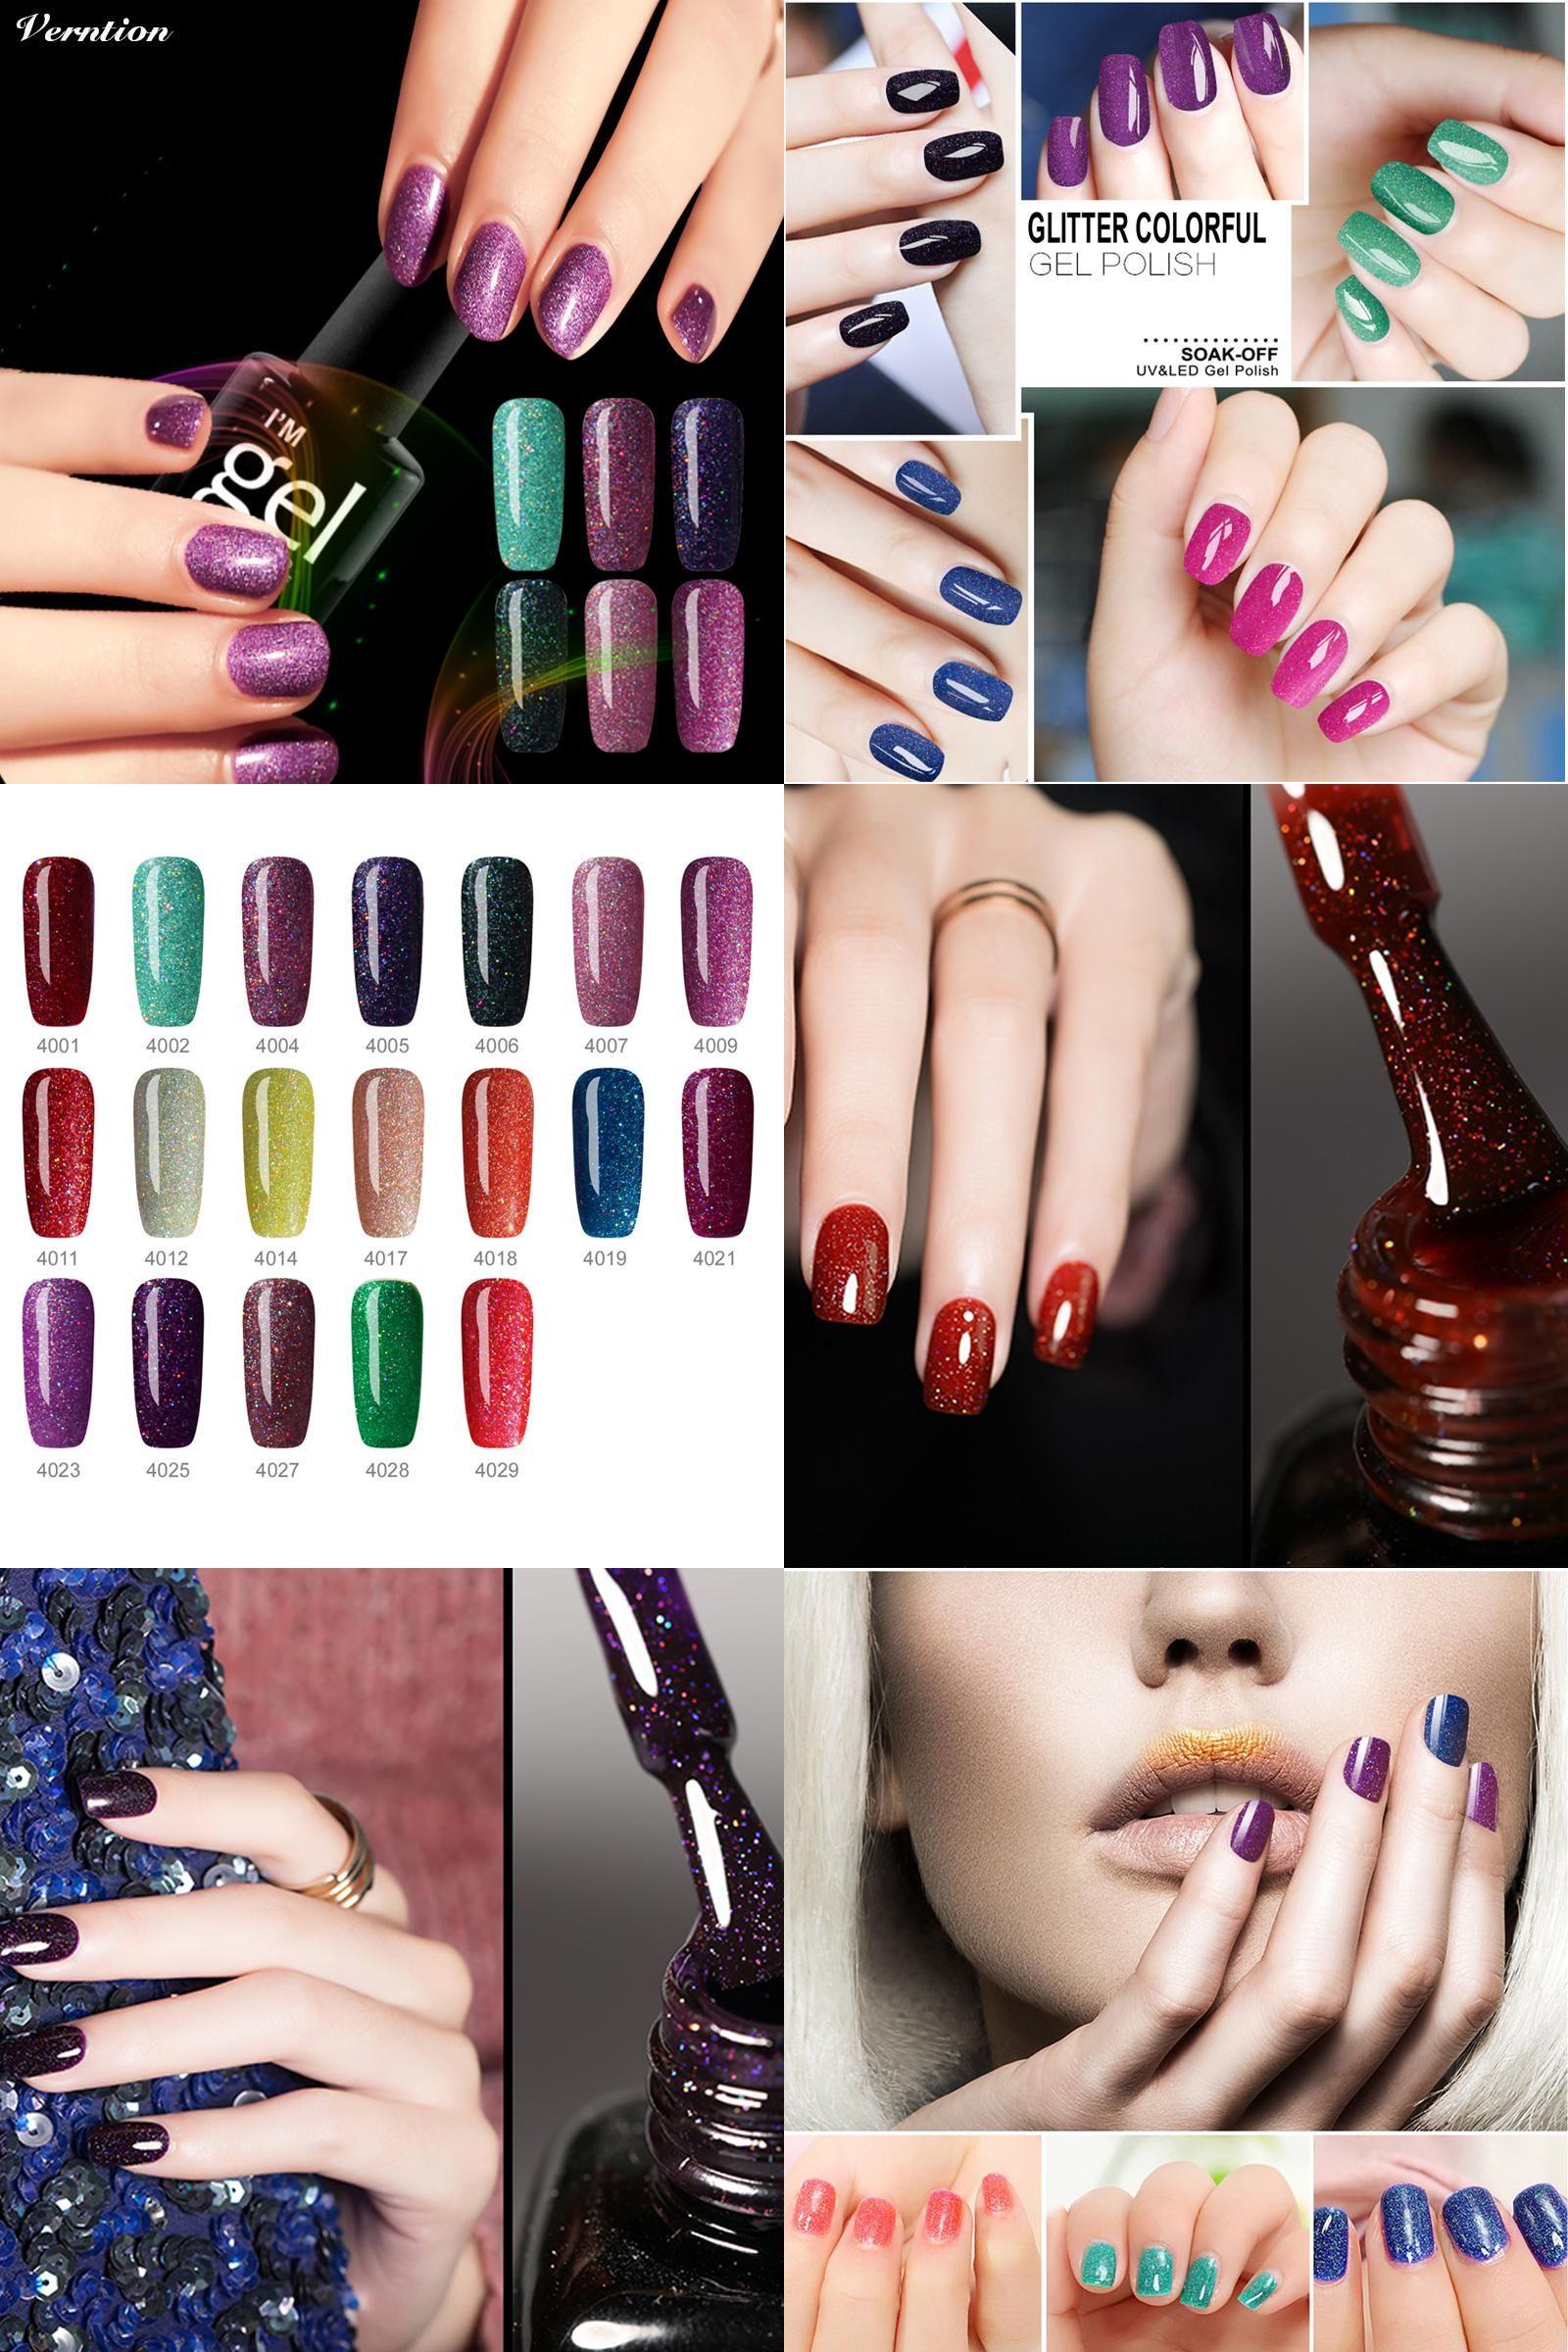 Visit To Buy 2017 Fashion Colorful Neon Gel Nail Polish Uv Lamp Soak Off Rainbow Bling 8ml Vernis Semi Perm With Images Gel Polish Nail Art Uv Nails Art Gel Nail Varnish